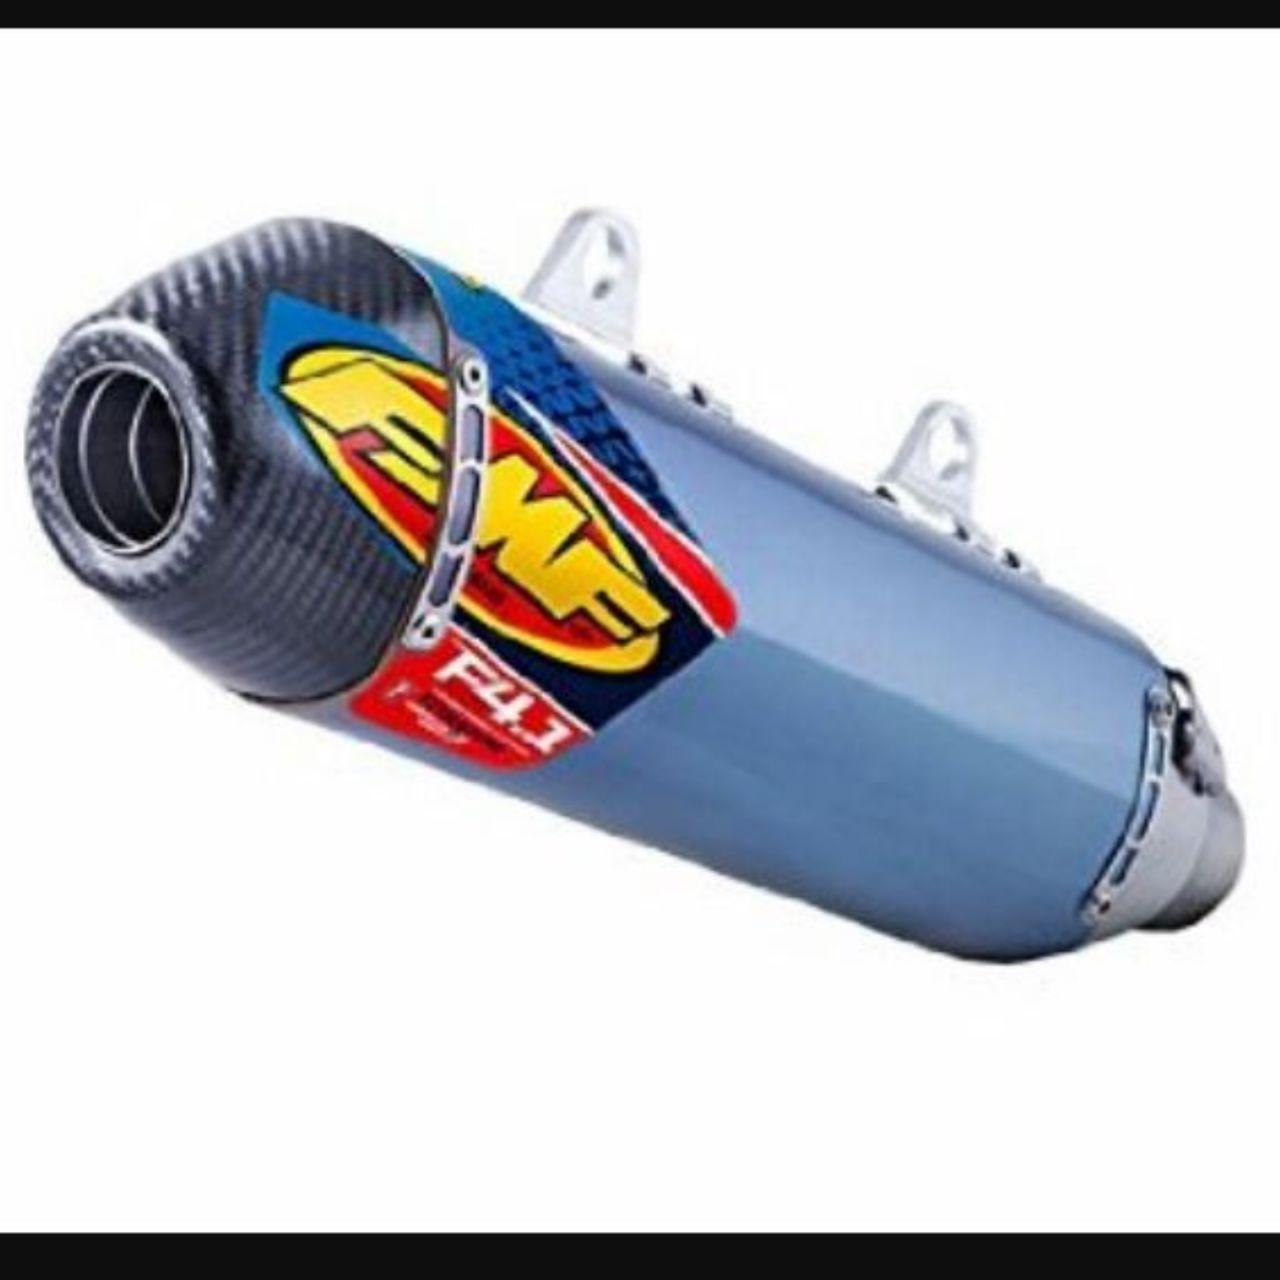 wpid wp 1464792801213 Jual KNALPOT merk FMF anodize blue Carbon F4.1 untuk KTM 250,350,450 th 07 s/d 17 dan Husq FE 250,350,450,501 th 14 s/d 17 Rp.9,000,000